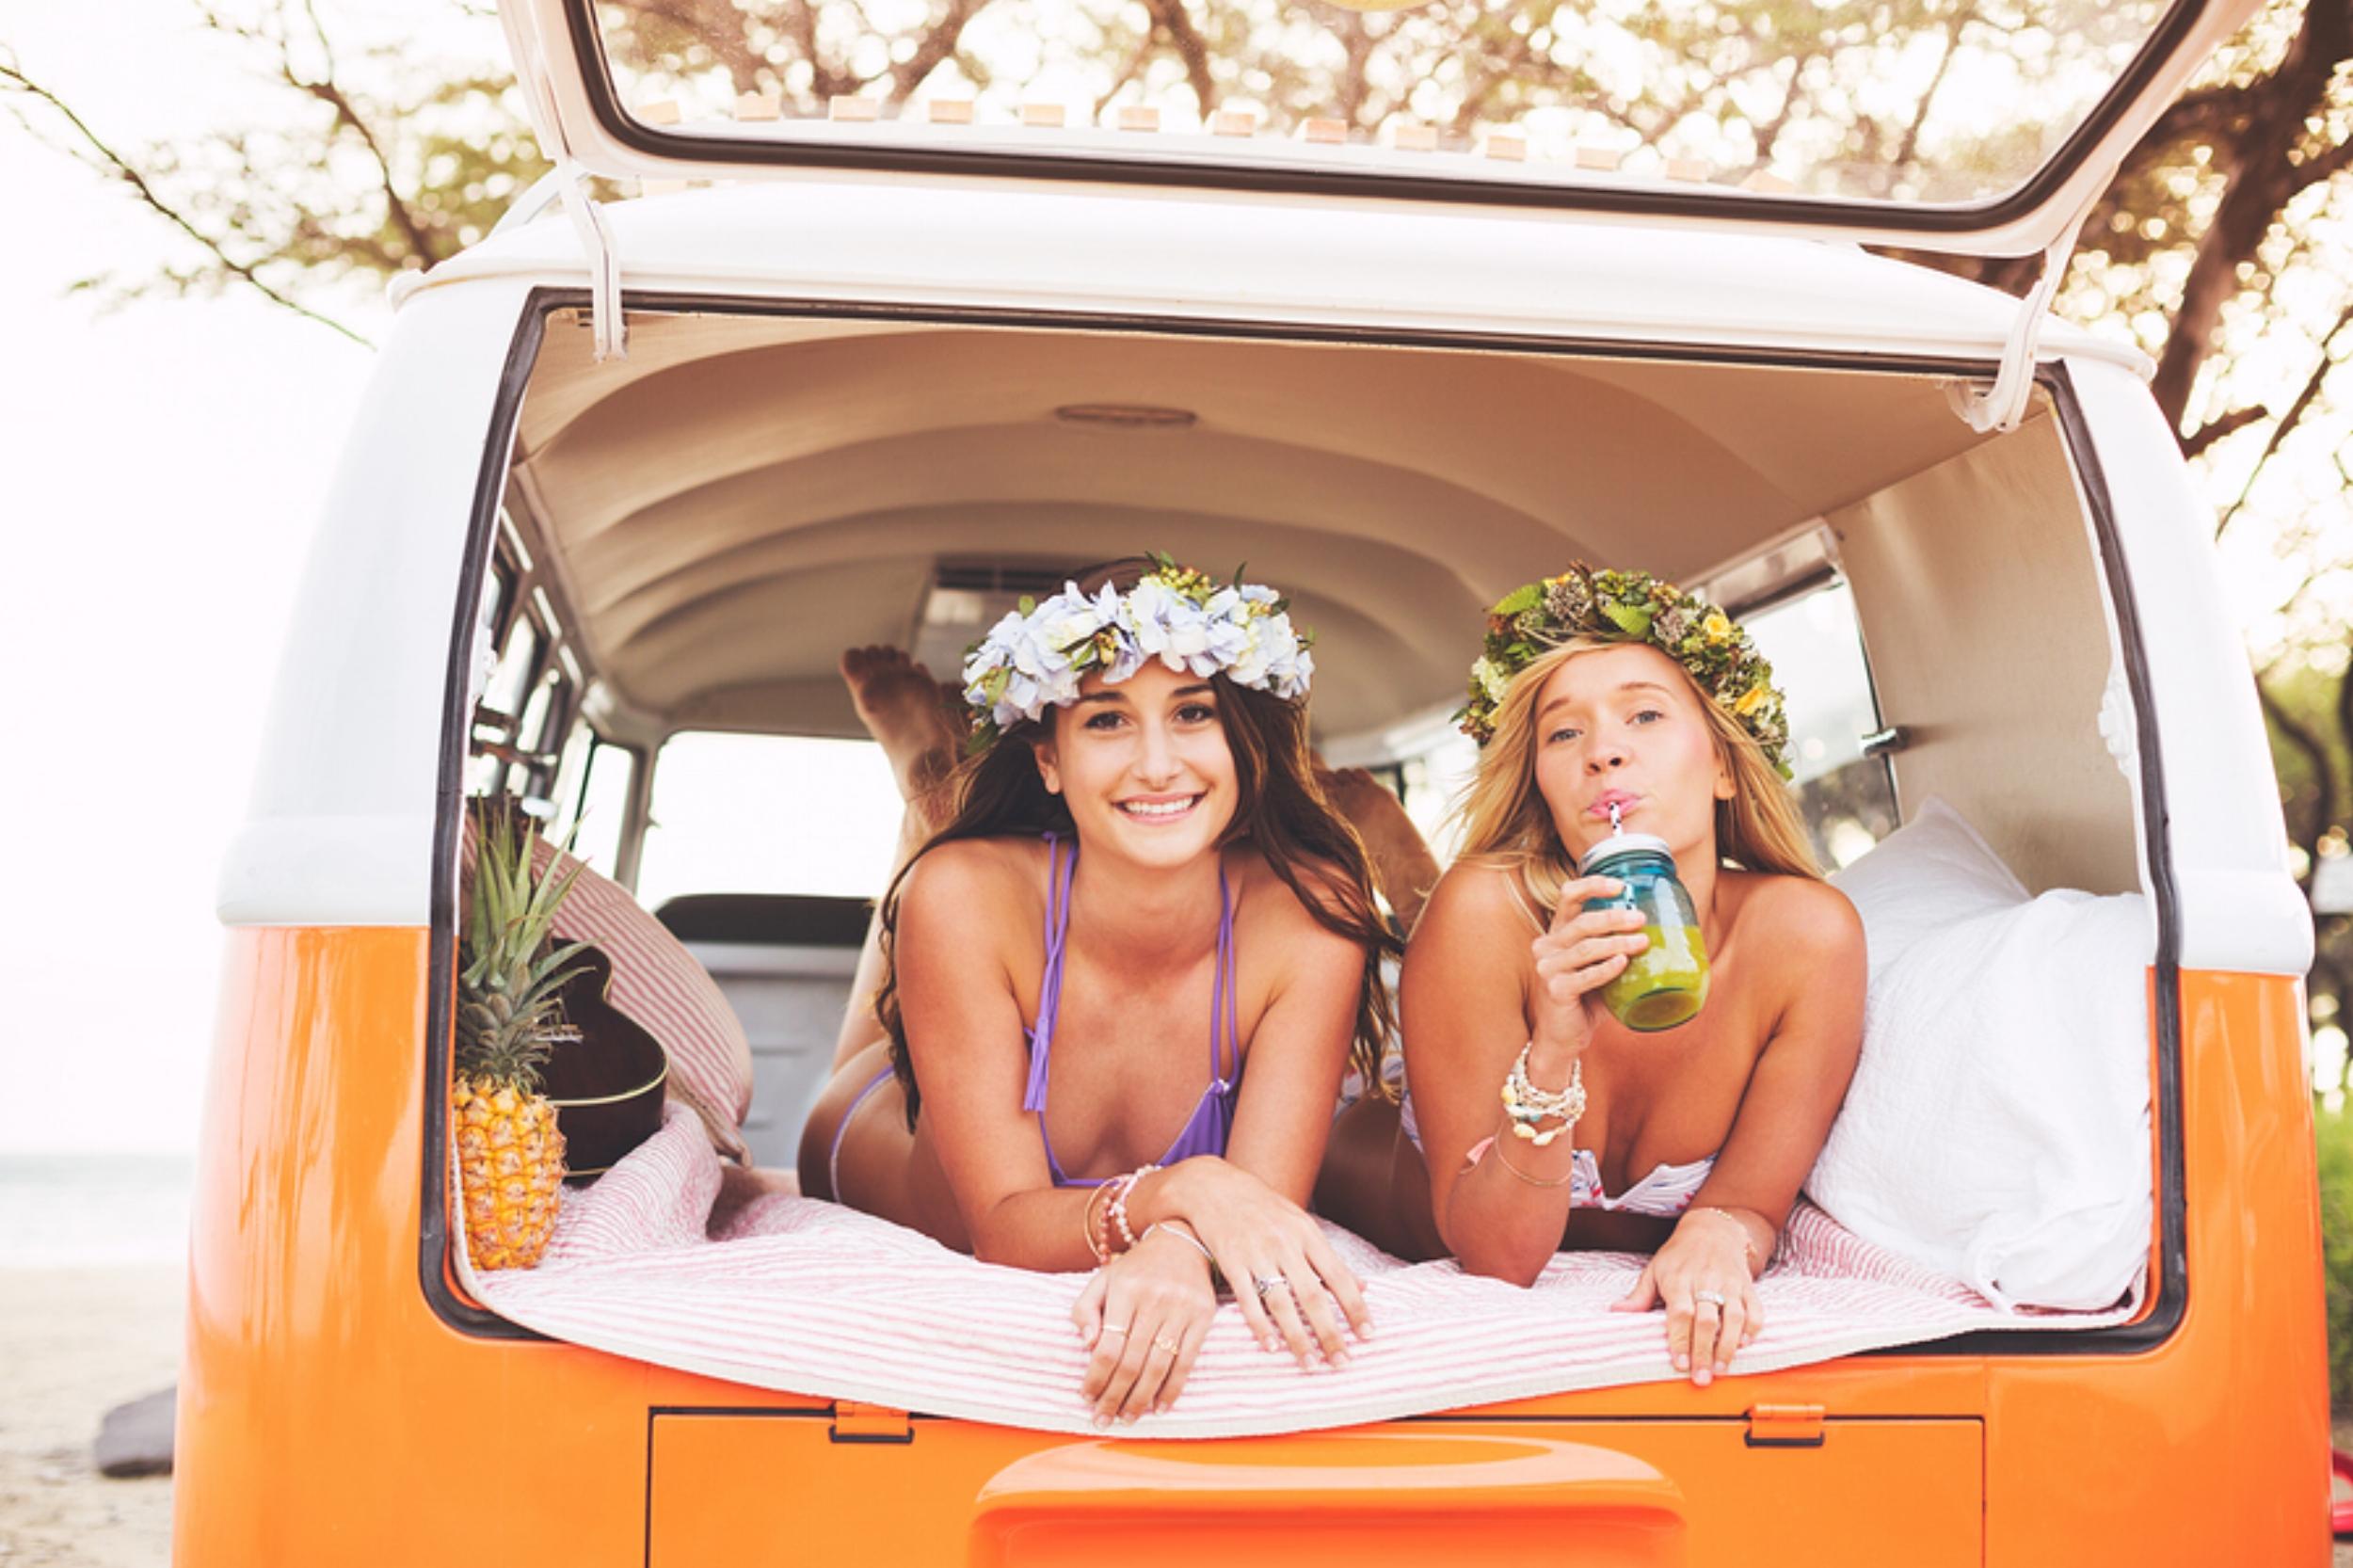 bigstock-Surfer-Girls-Beach-Lifestyle--91125371.jpg